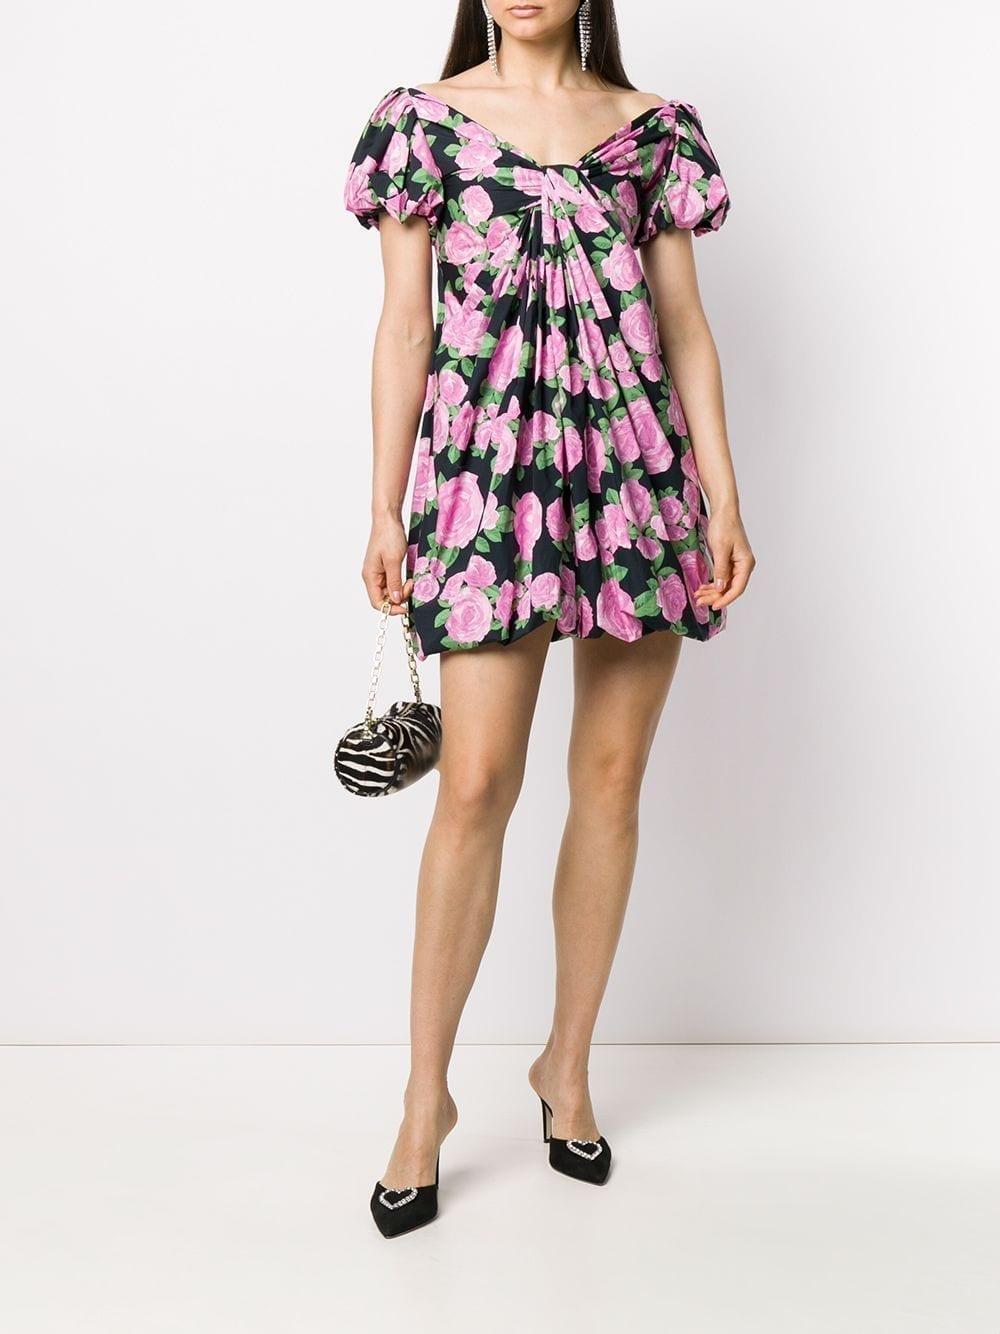 GIUSEPPE DI MORABITO Flared Rose-Print Dress